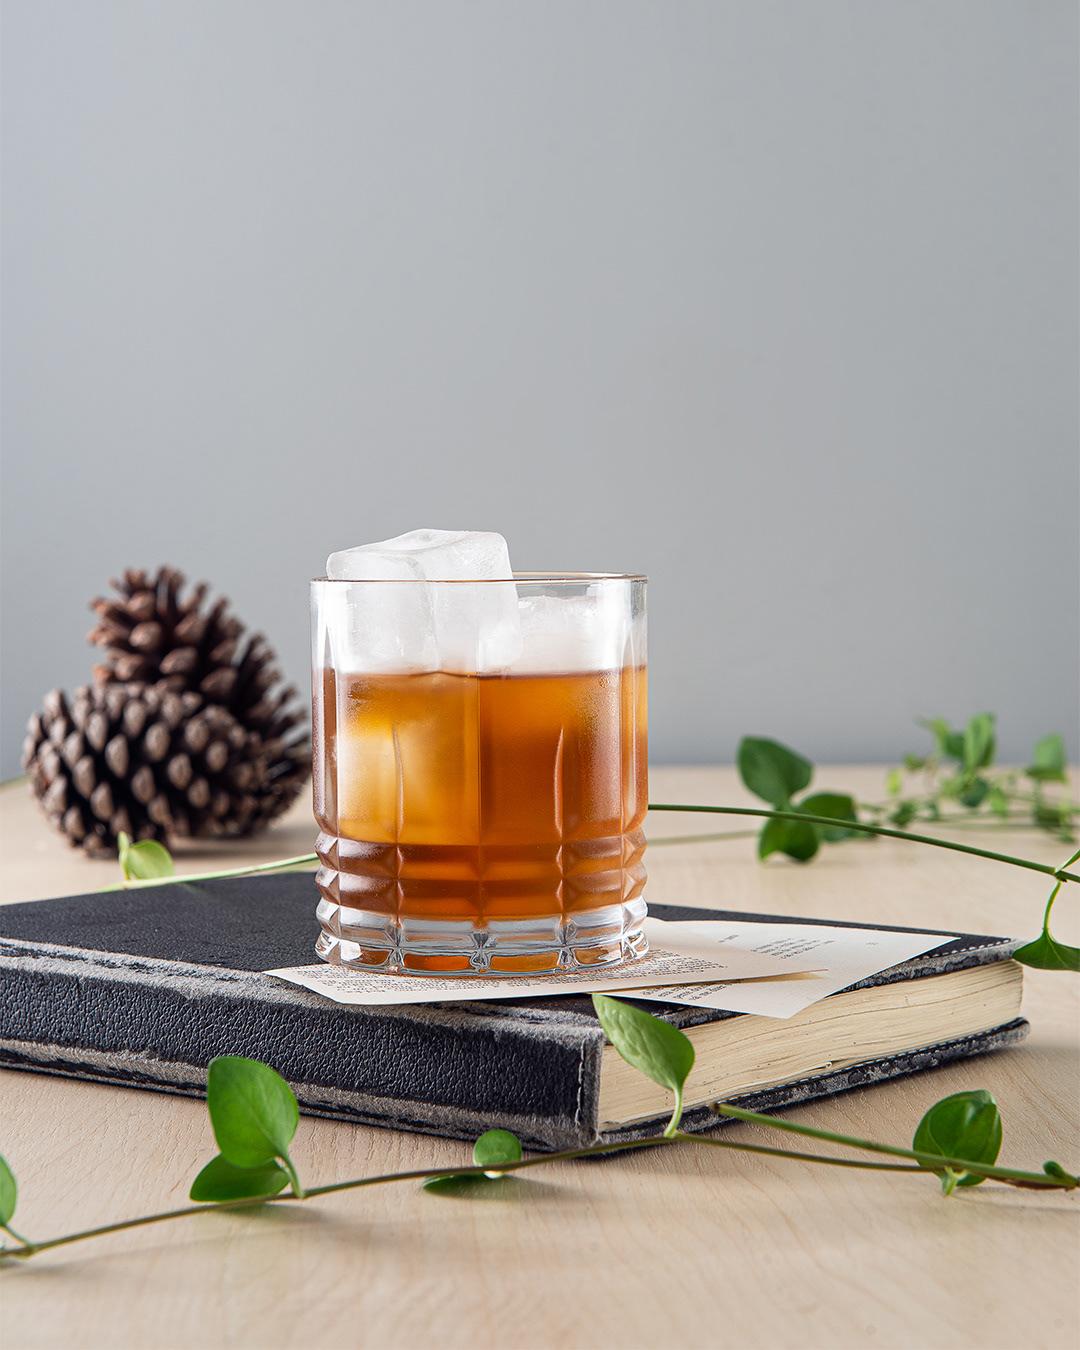 Adobe Portfolio drinks drinks engarrafados photography content